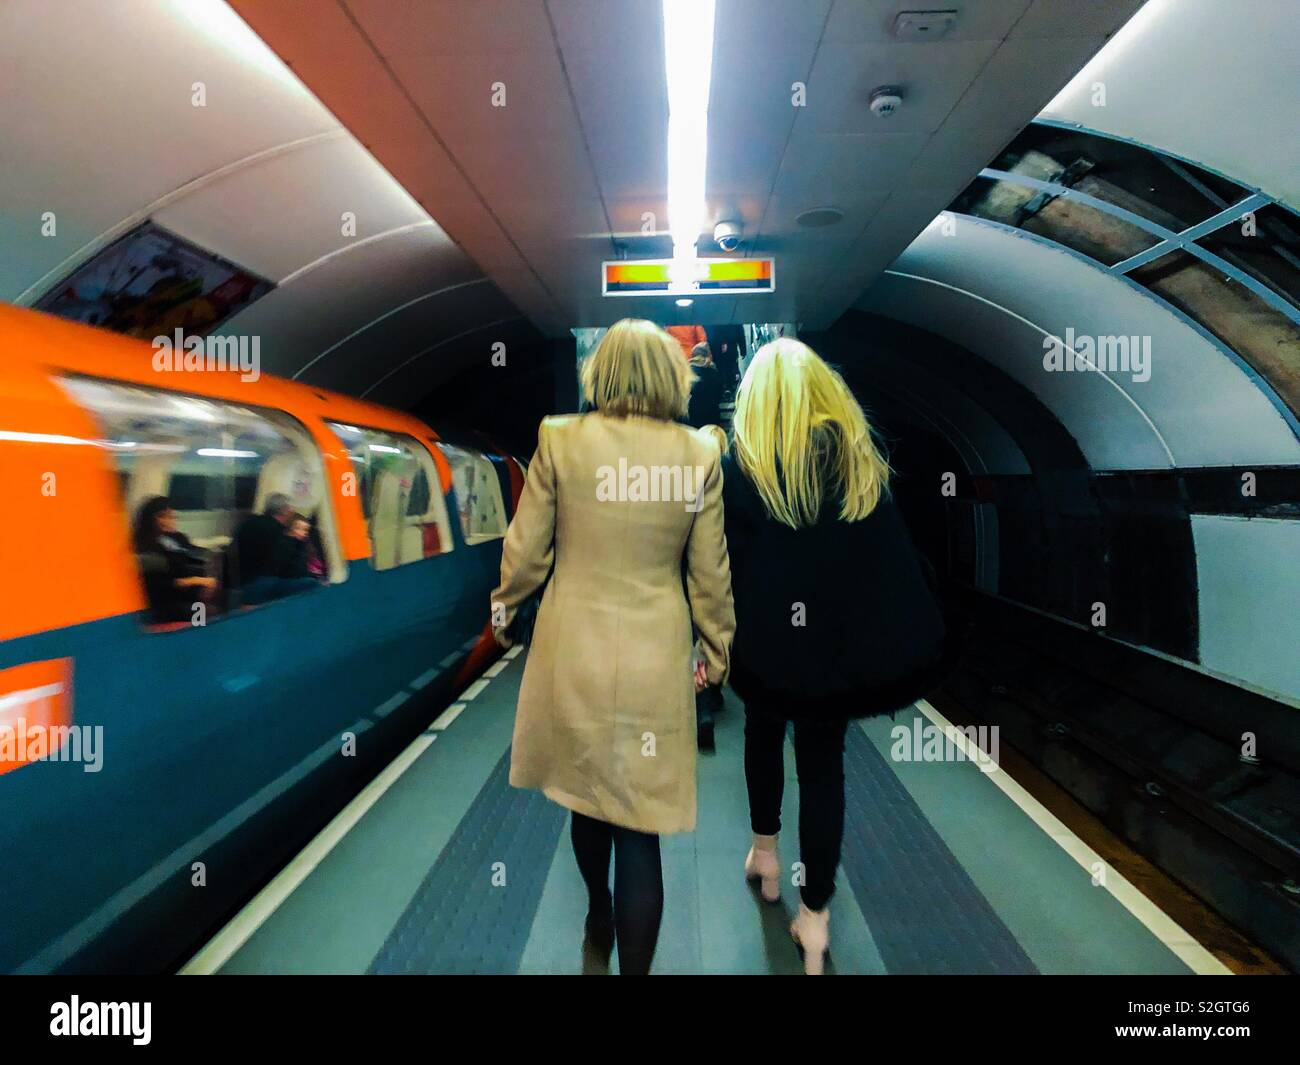 Train leaving station and passengers leaving platform, Glasgow subway. Scotland. UK. - Stock Image